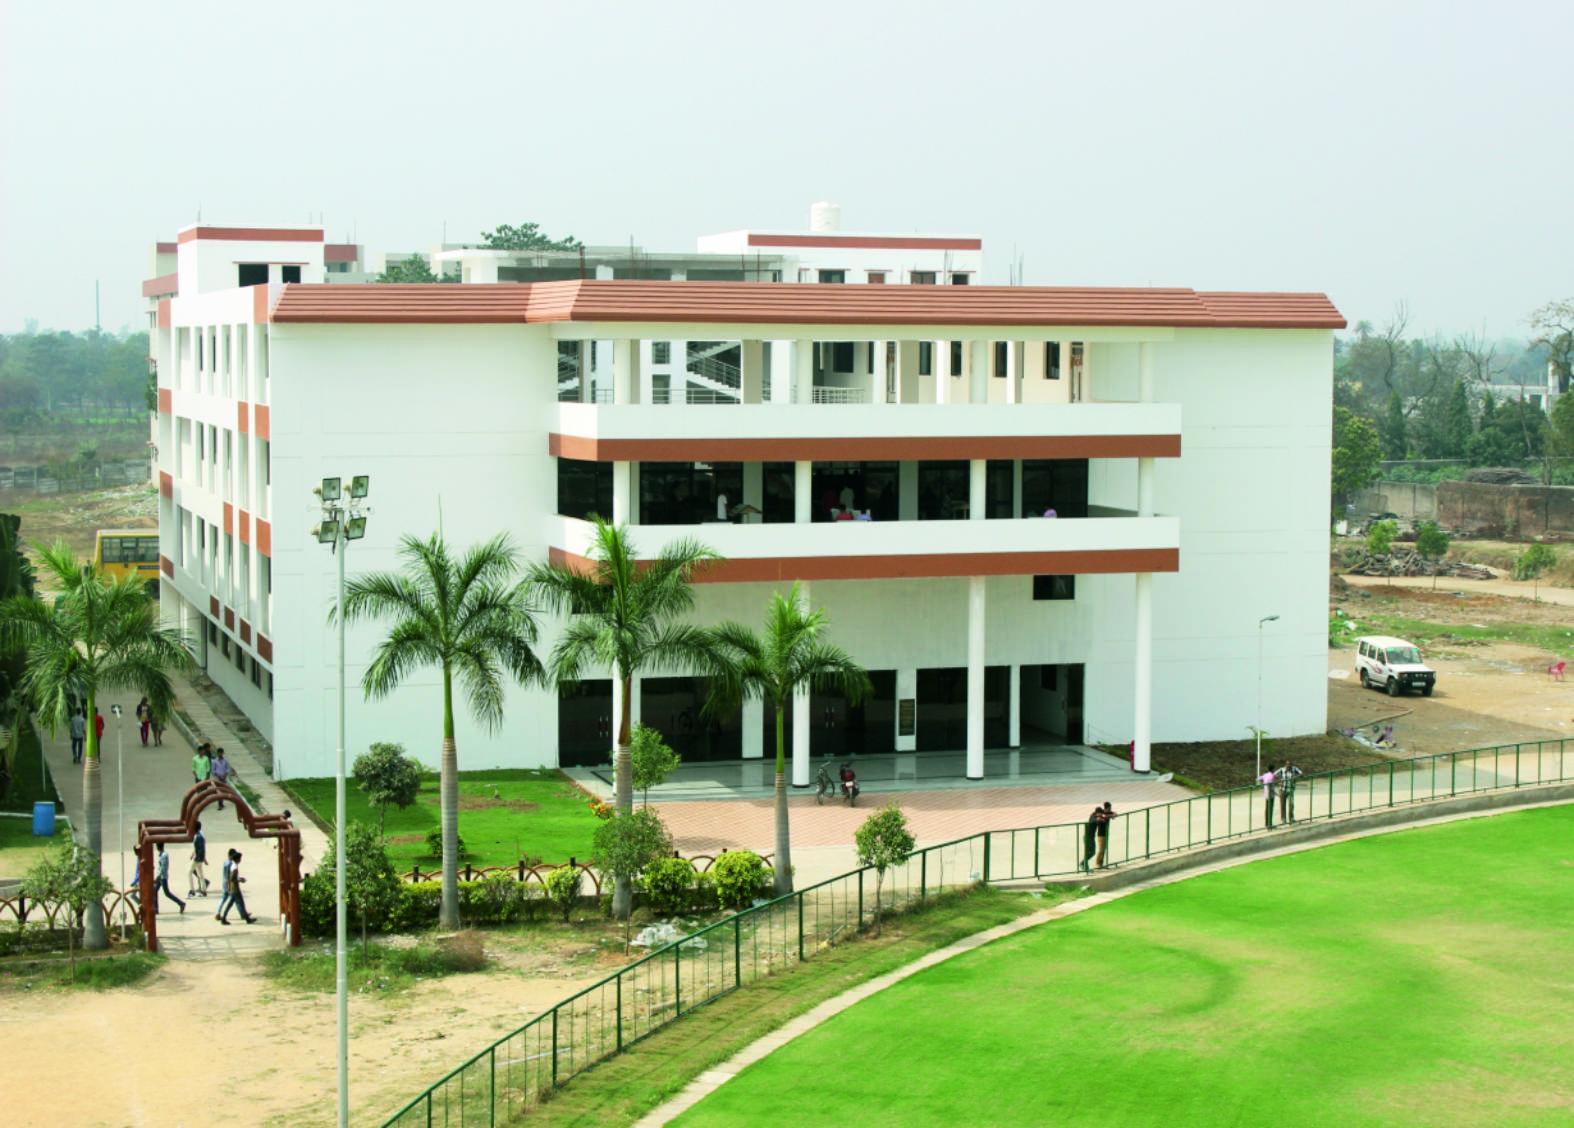 VHSS Bargarh Campus